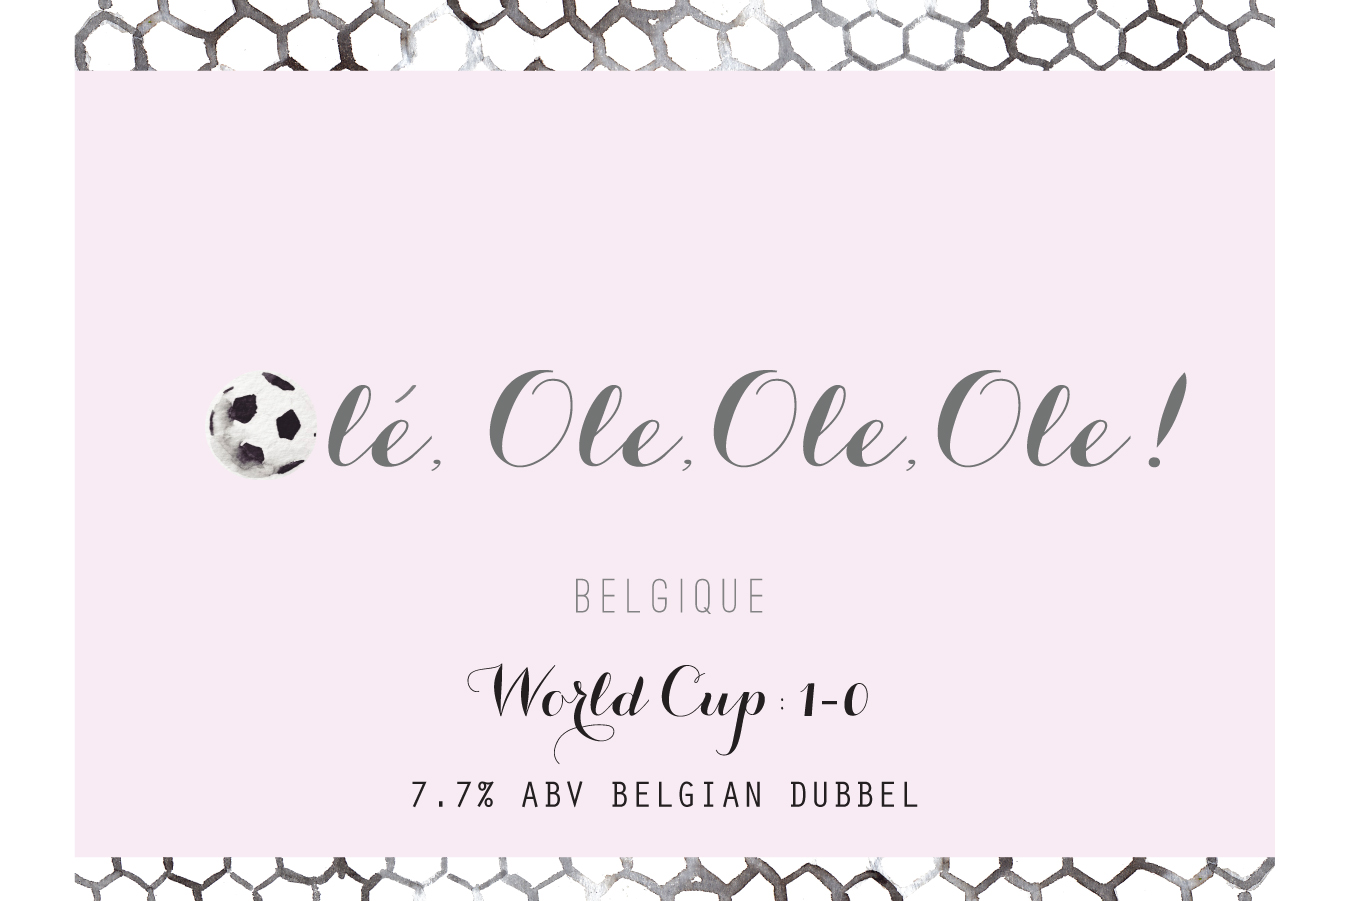 World Cup 1-0.jpg